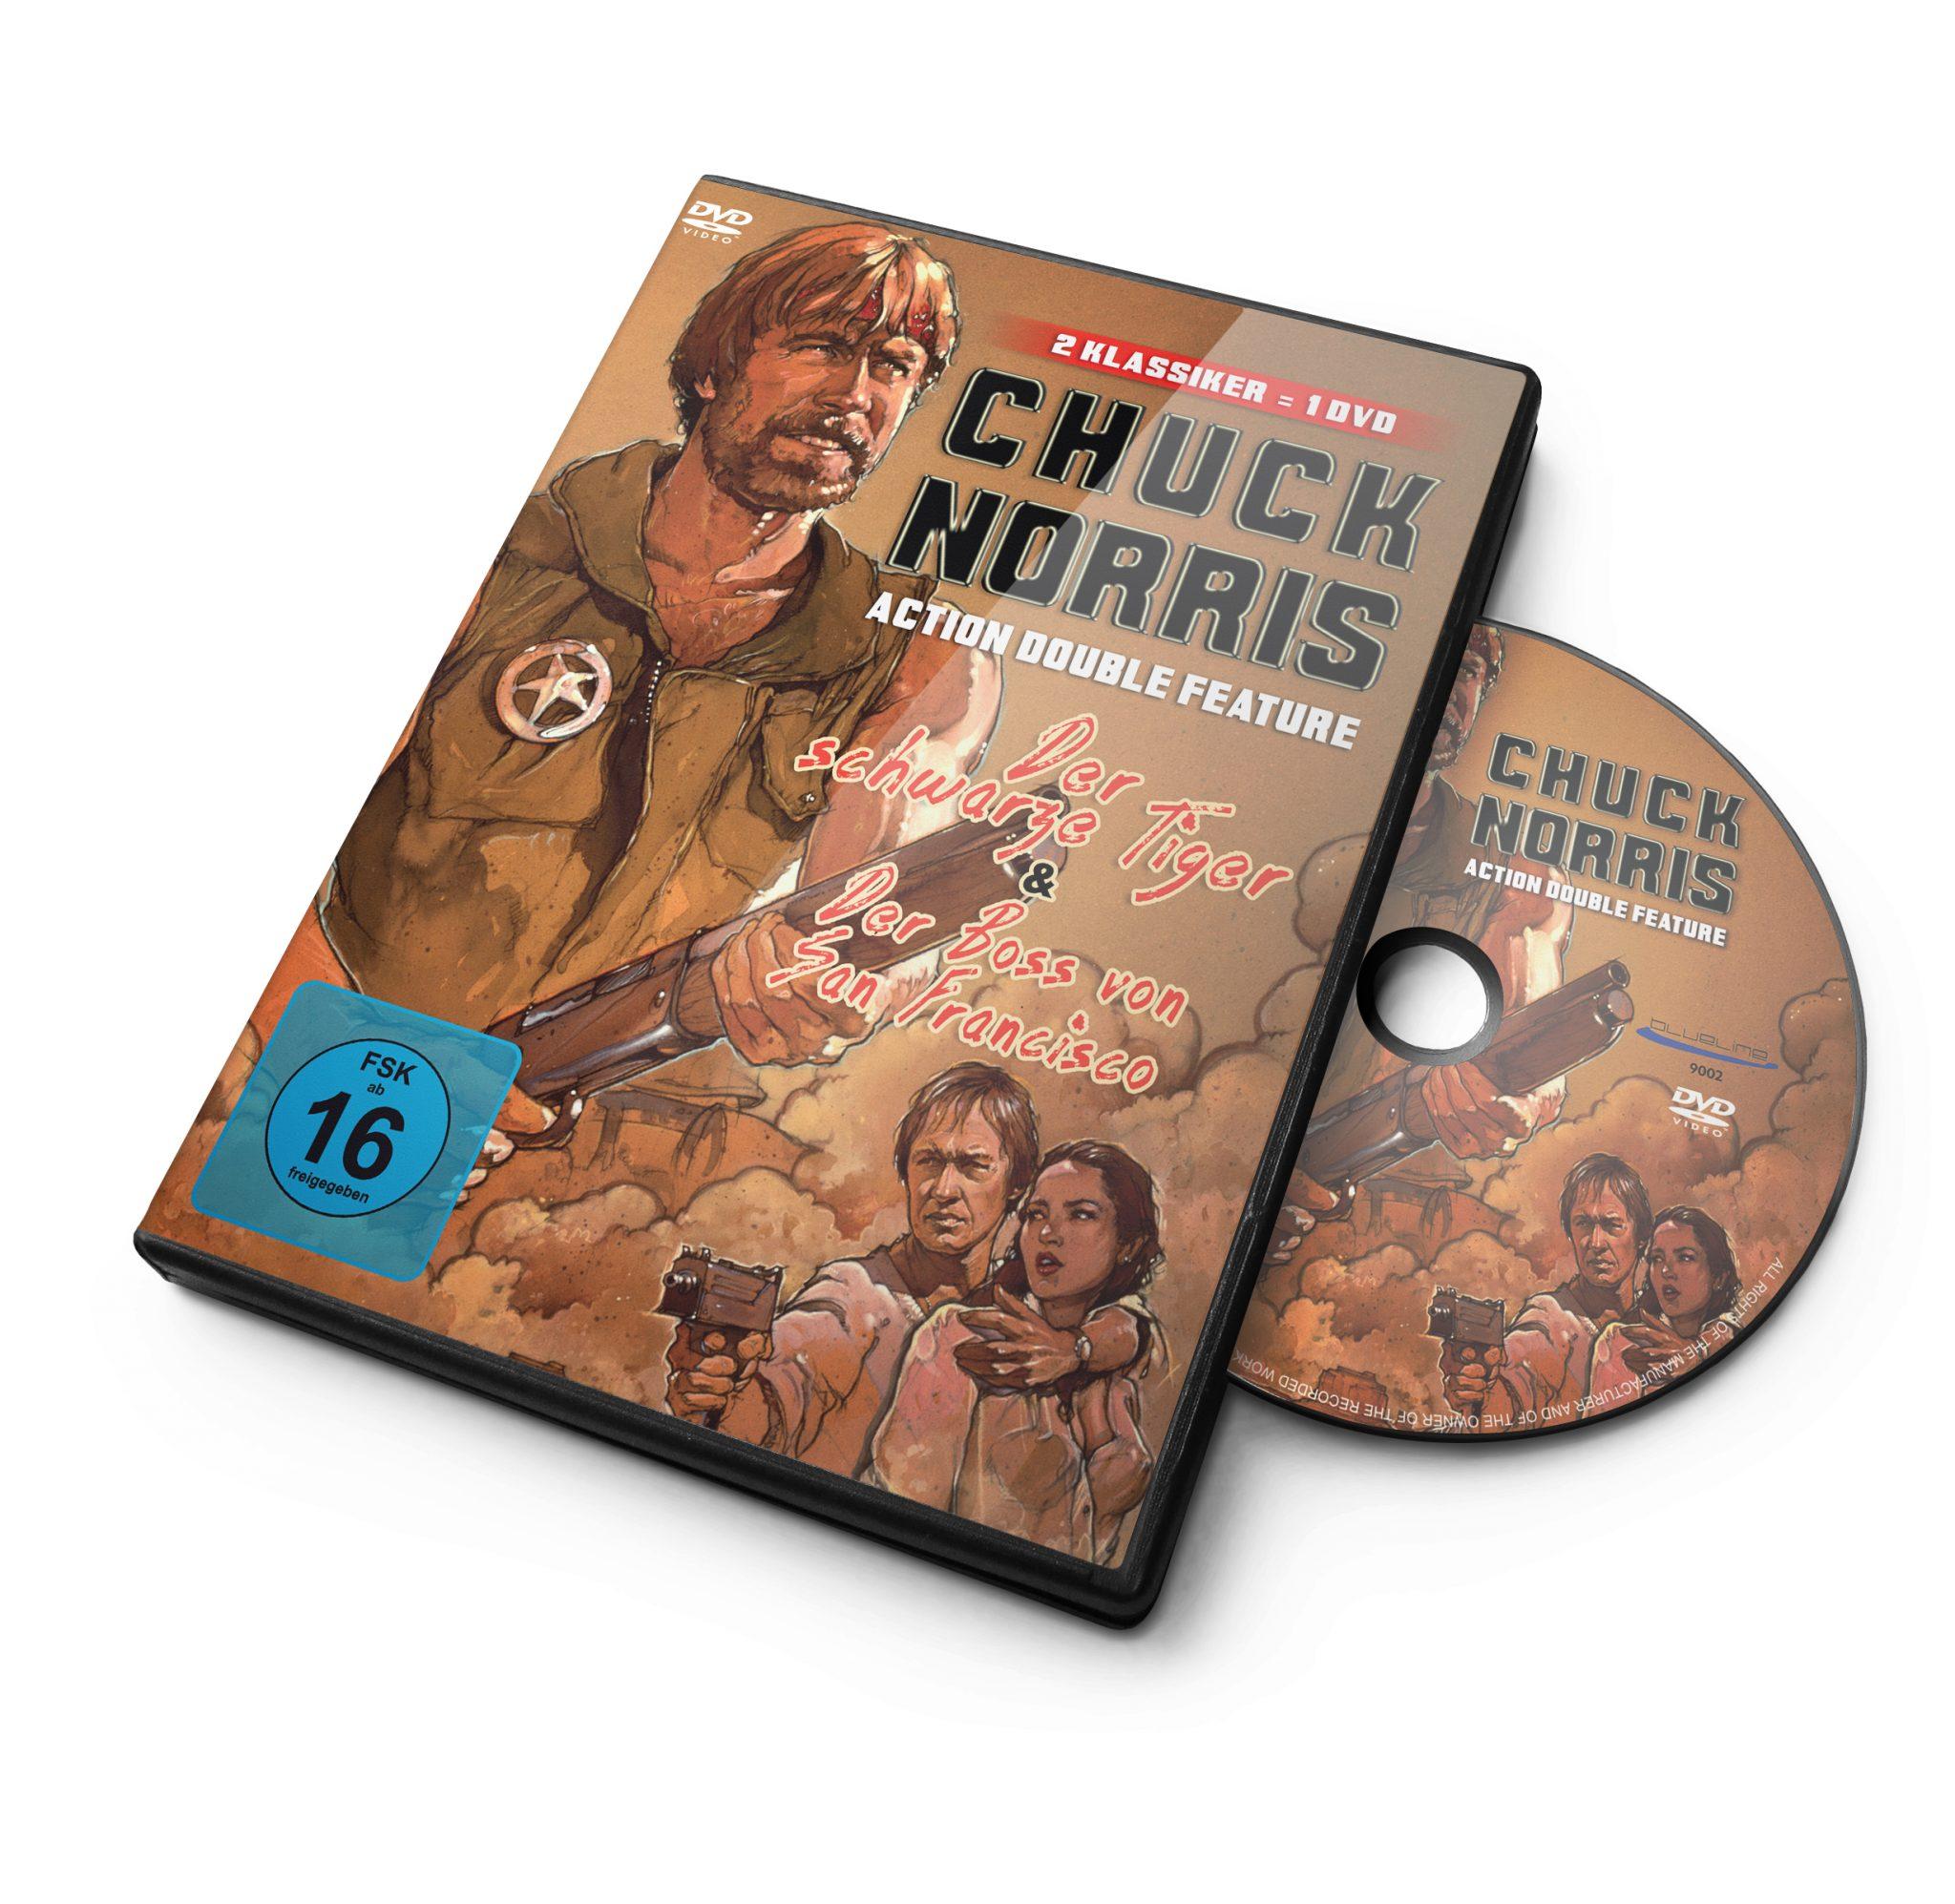 chuck norris_dvd